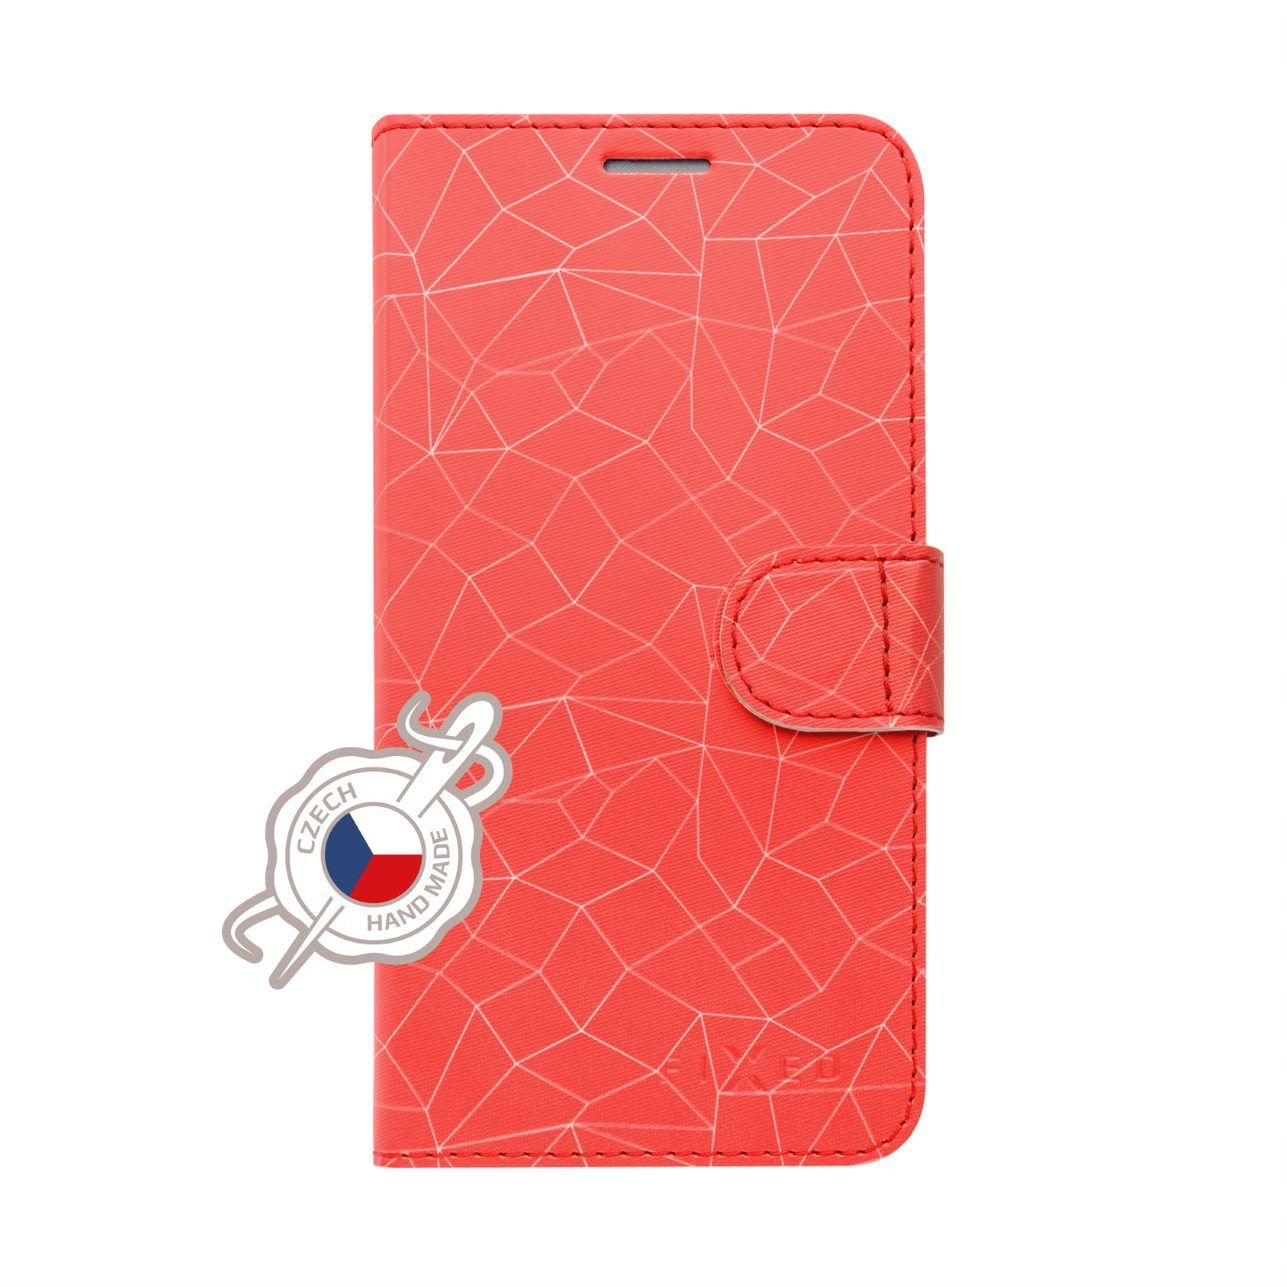 FIXED FIT flipové pouzdro pro Samsung Galaxy A70, motiv Red Mesh